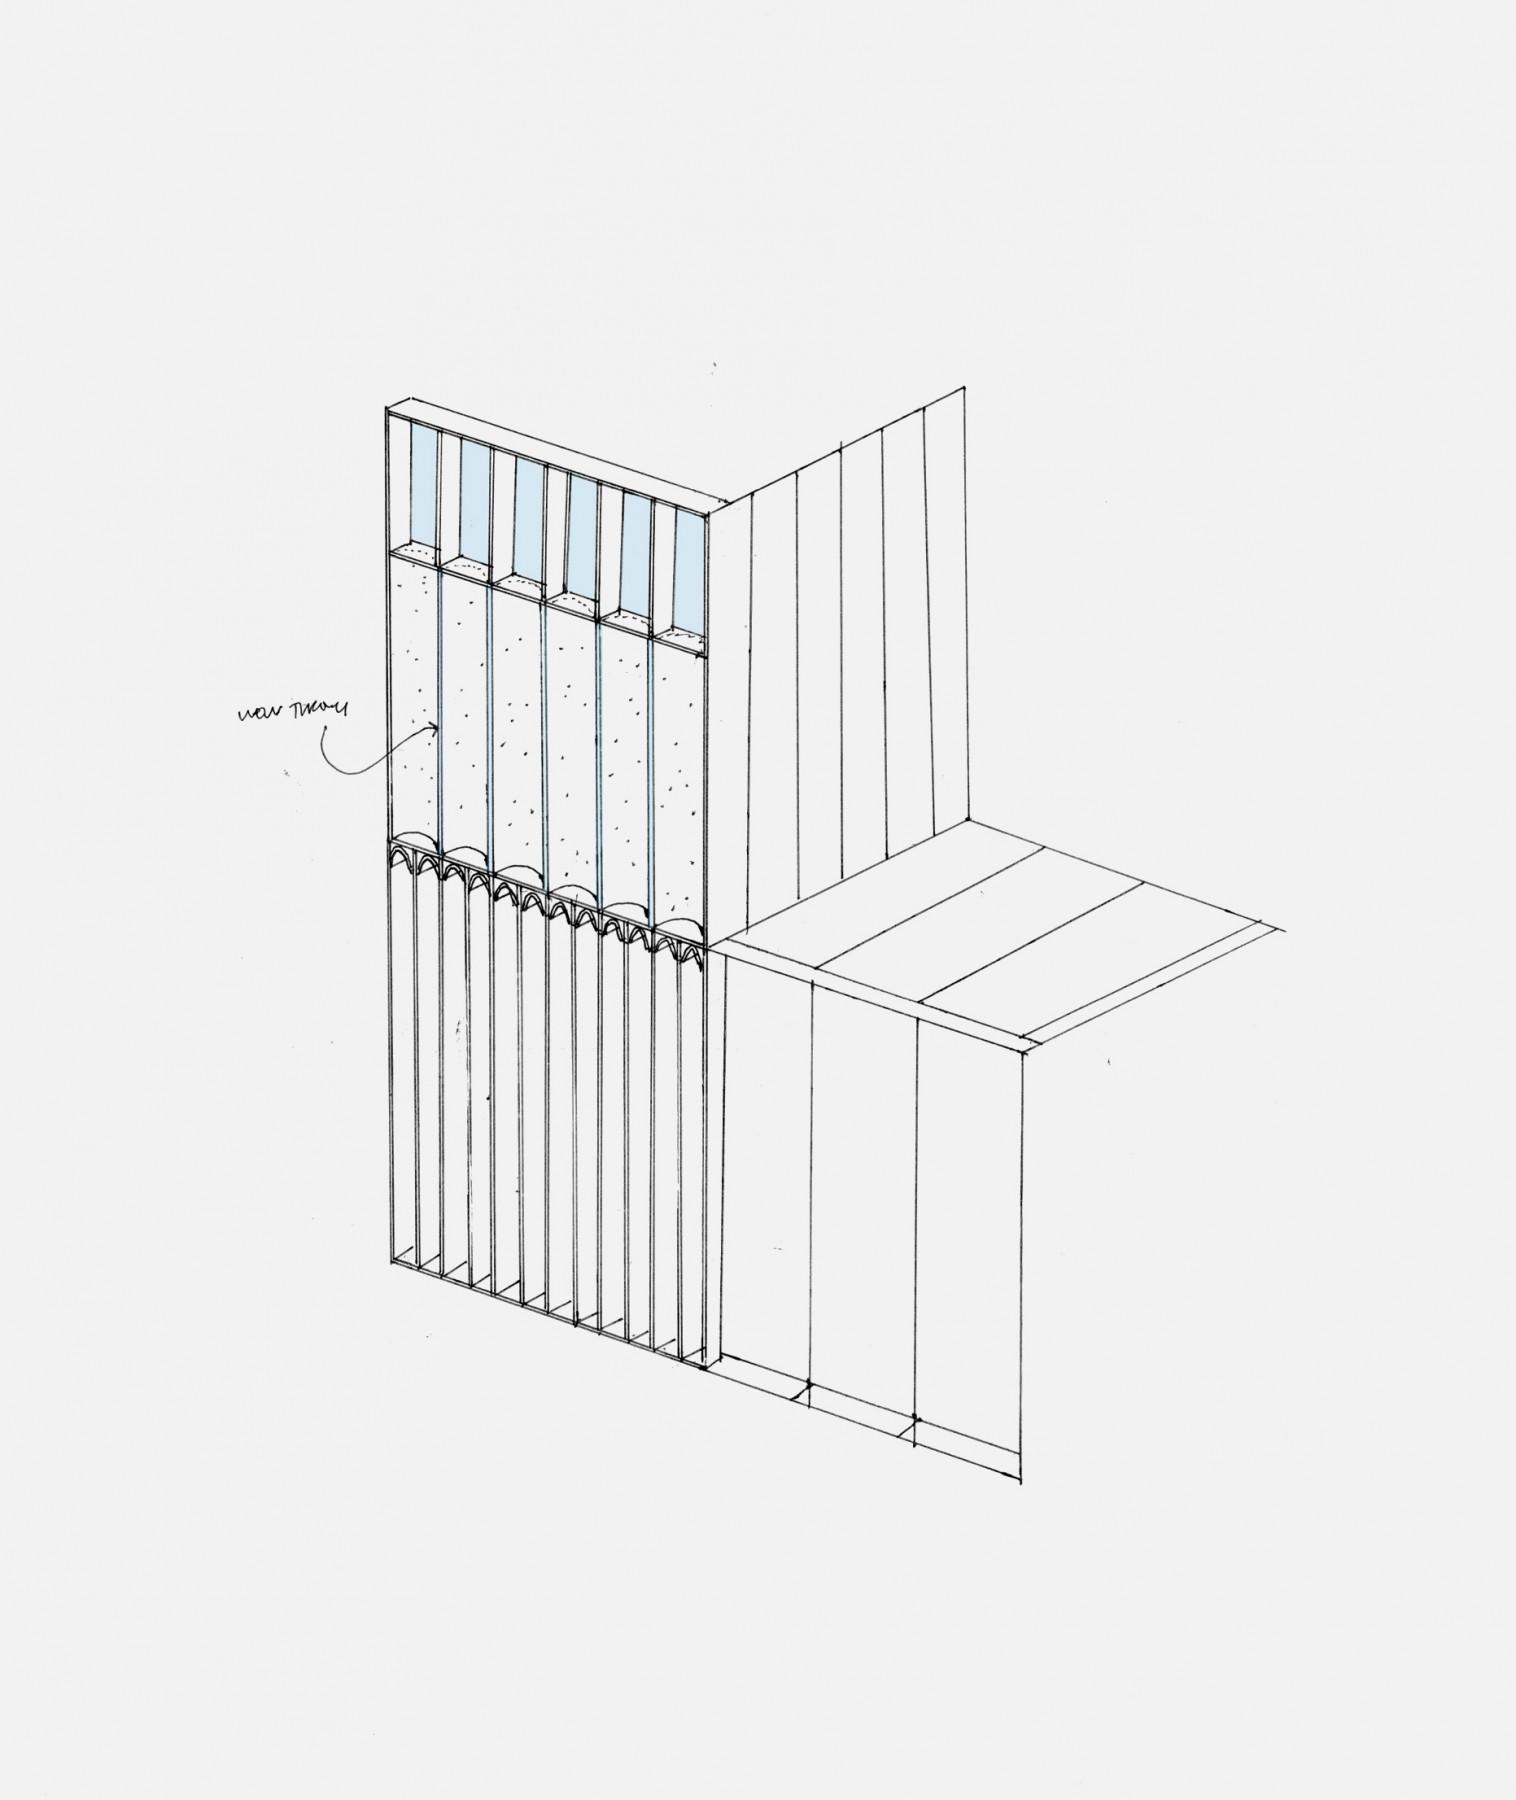 Barnsbury house extension in corten, sketch